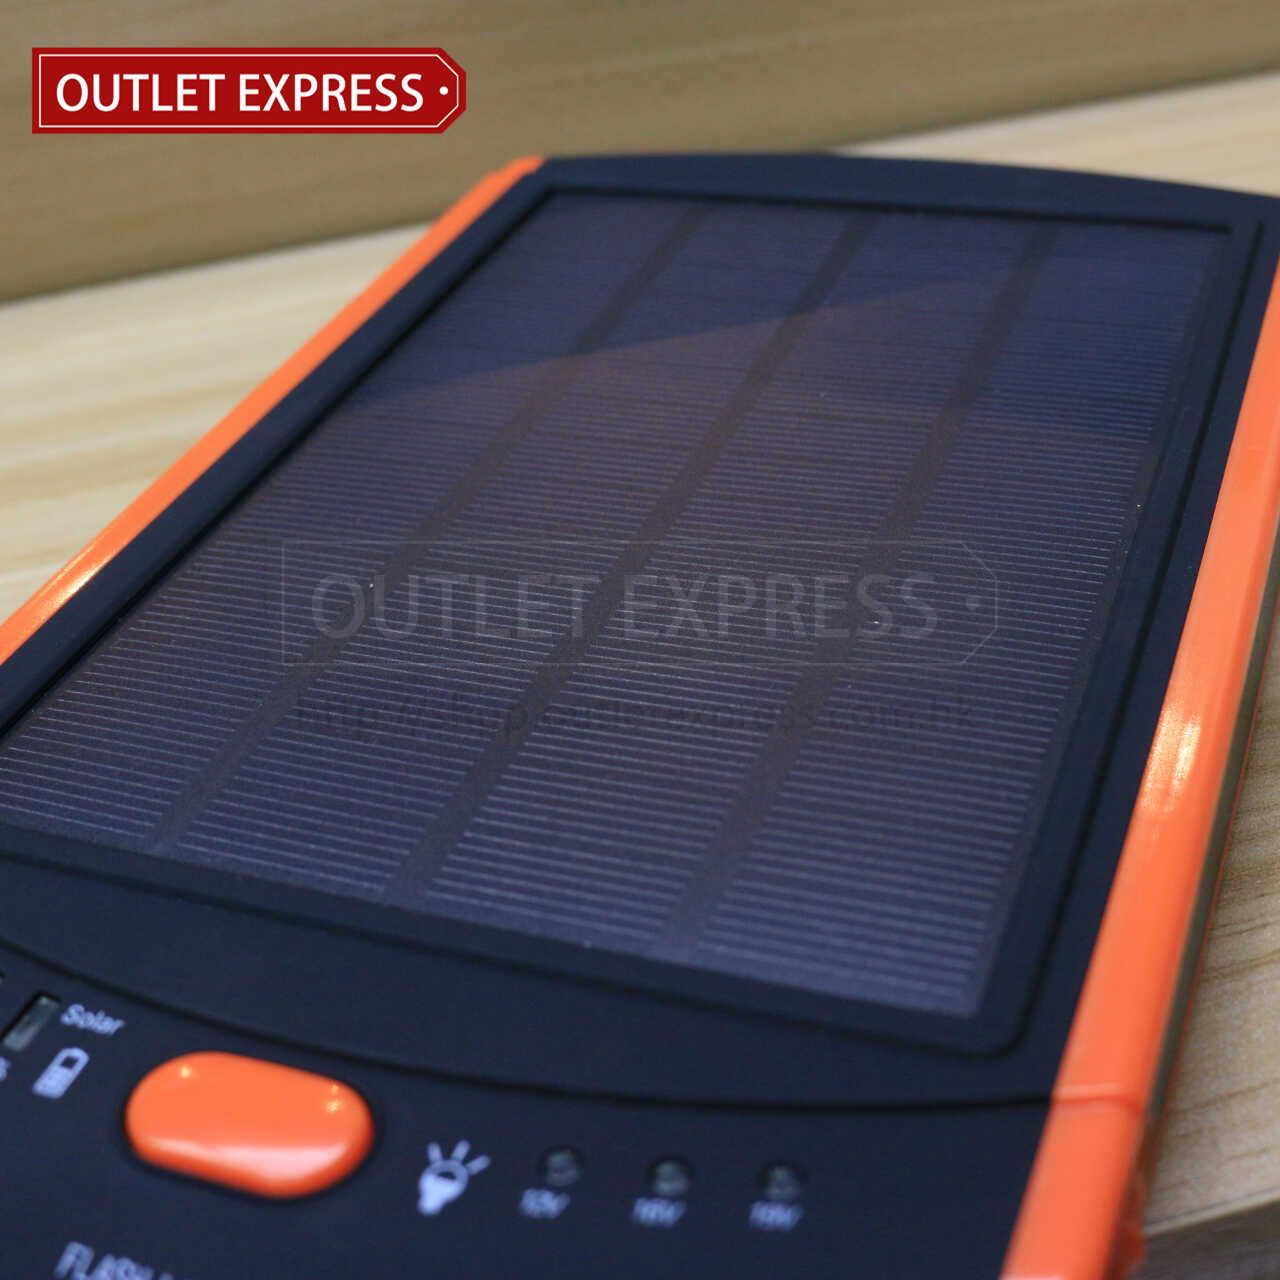 23000mAH 超薄太陽能移動電源- Outlet Express HK 生活百貨城實拍圖